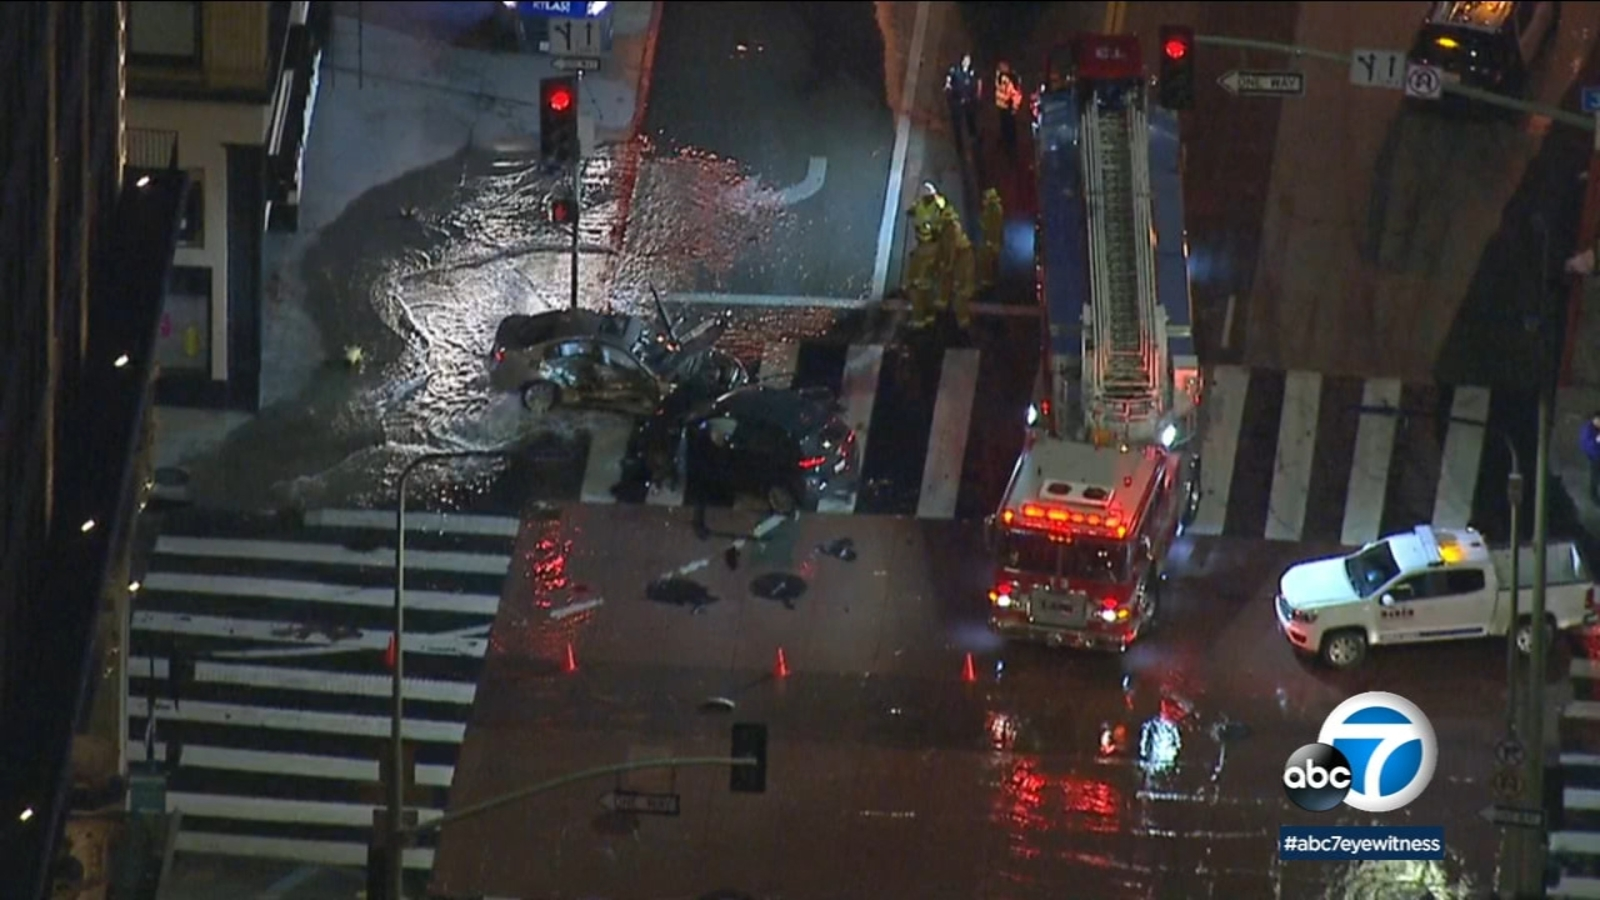 Car Crash Los Angeles: Downtown Los Angeles: 2-car Crash Shears Fire Hydrant